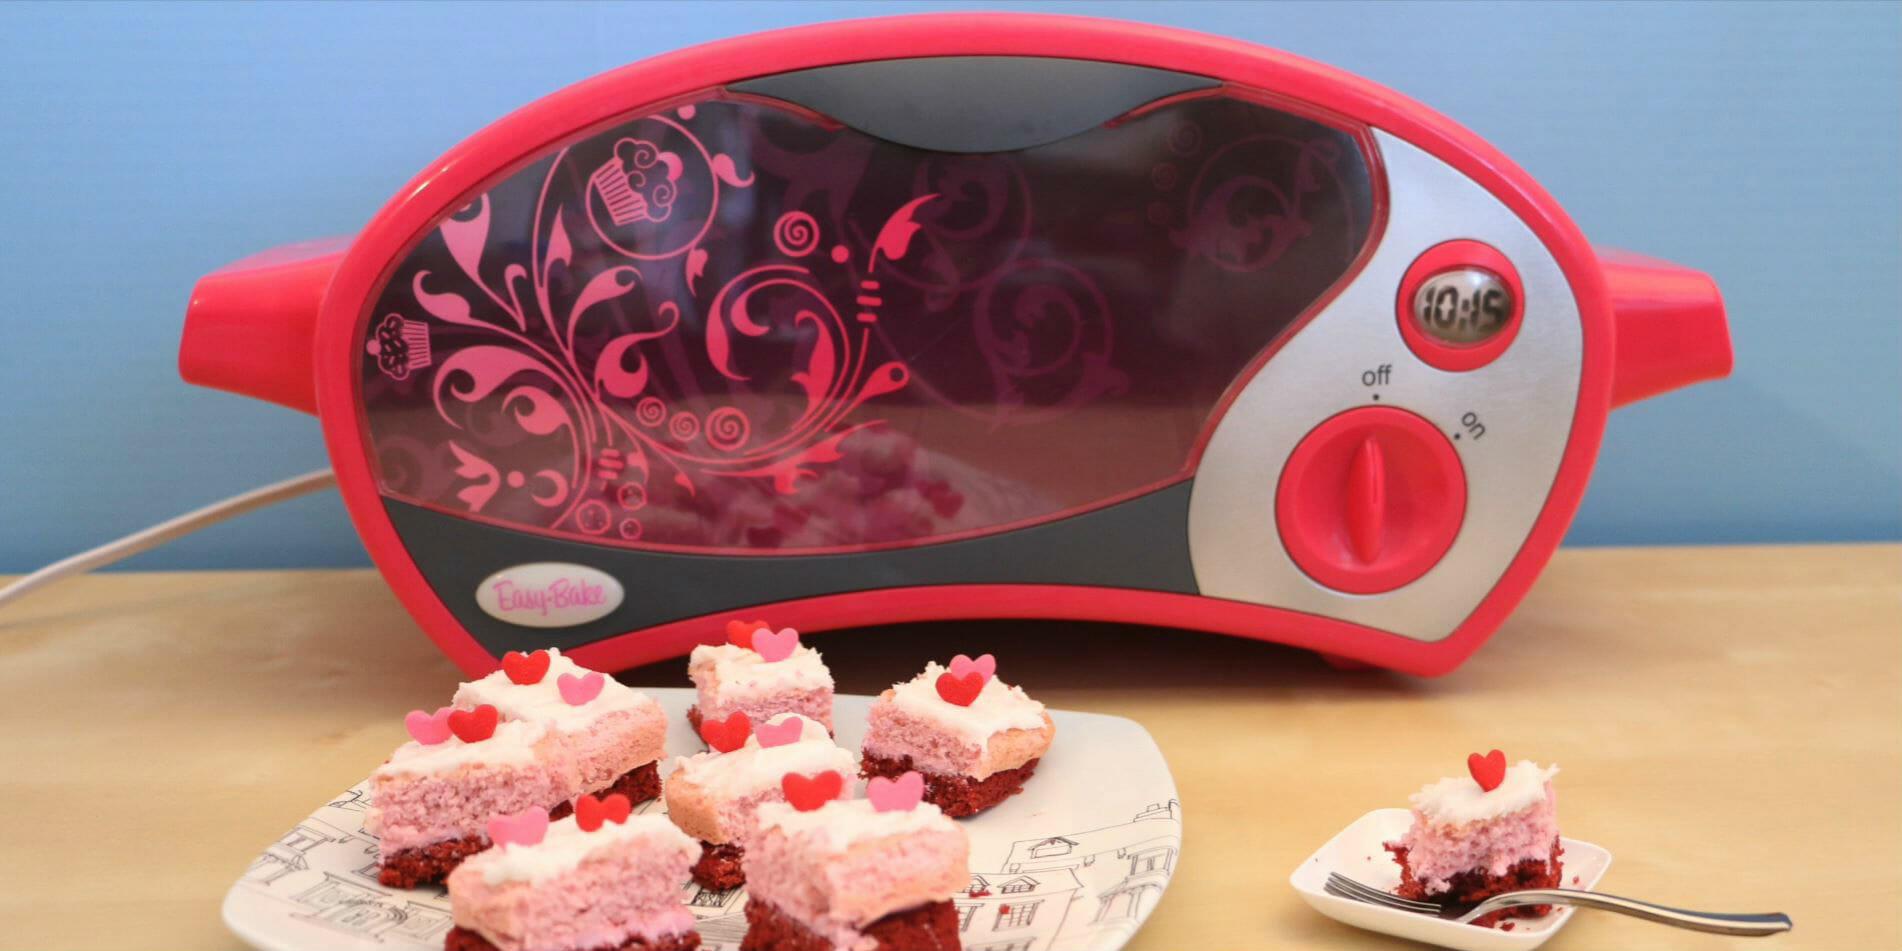 Bake Oven Toys 63